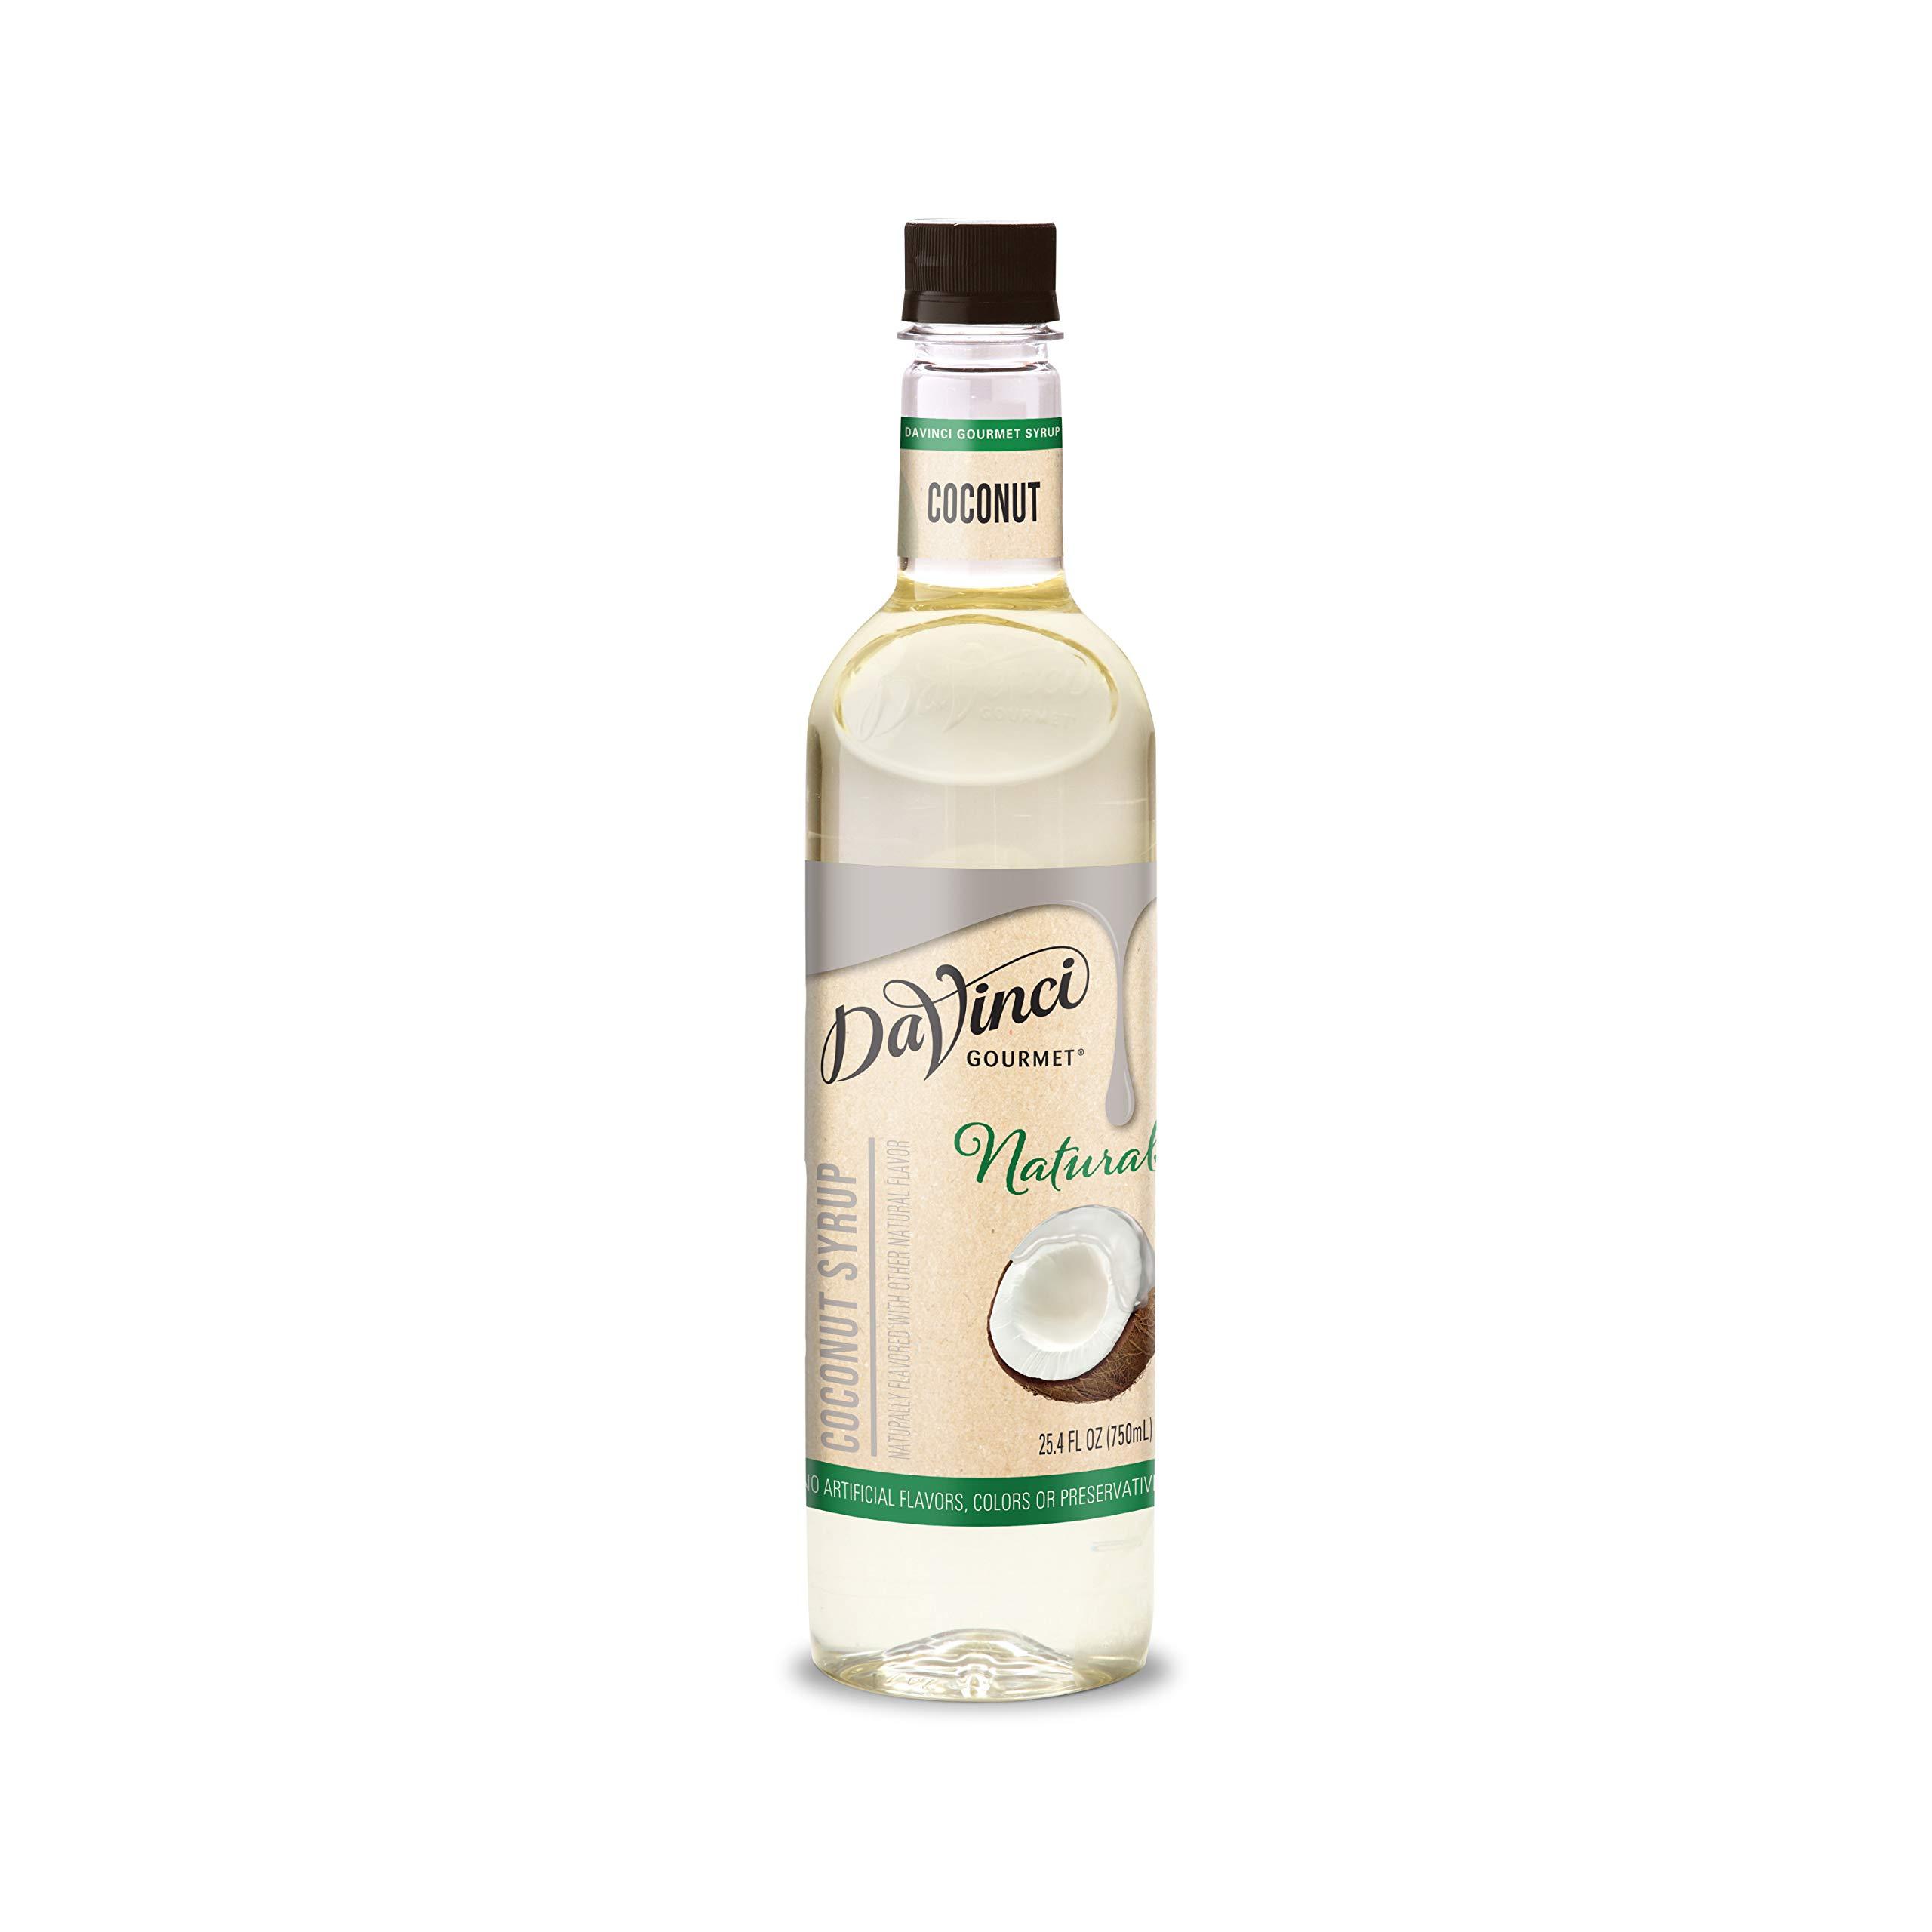 DaVinci Gourmet Natural Coffee Syrup, Coconut, 25.4 Fl Oz Bottle…